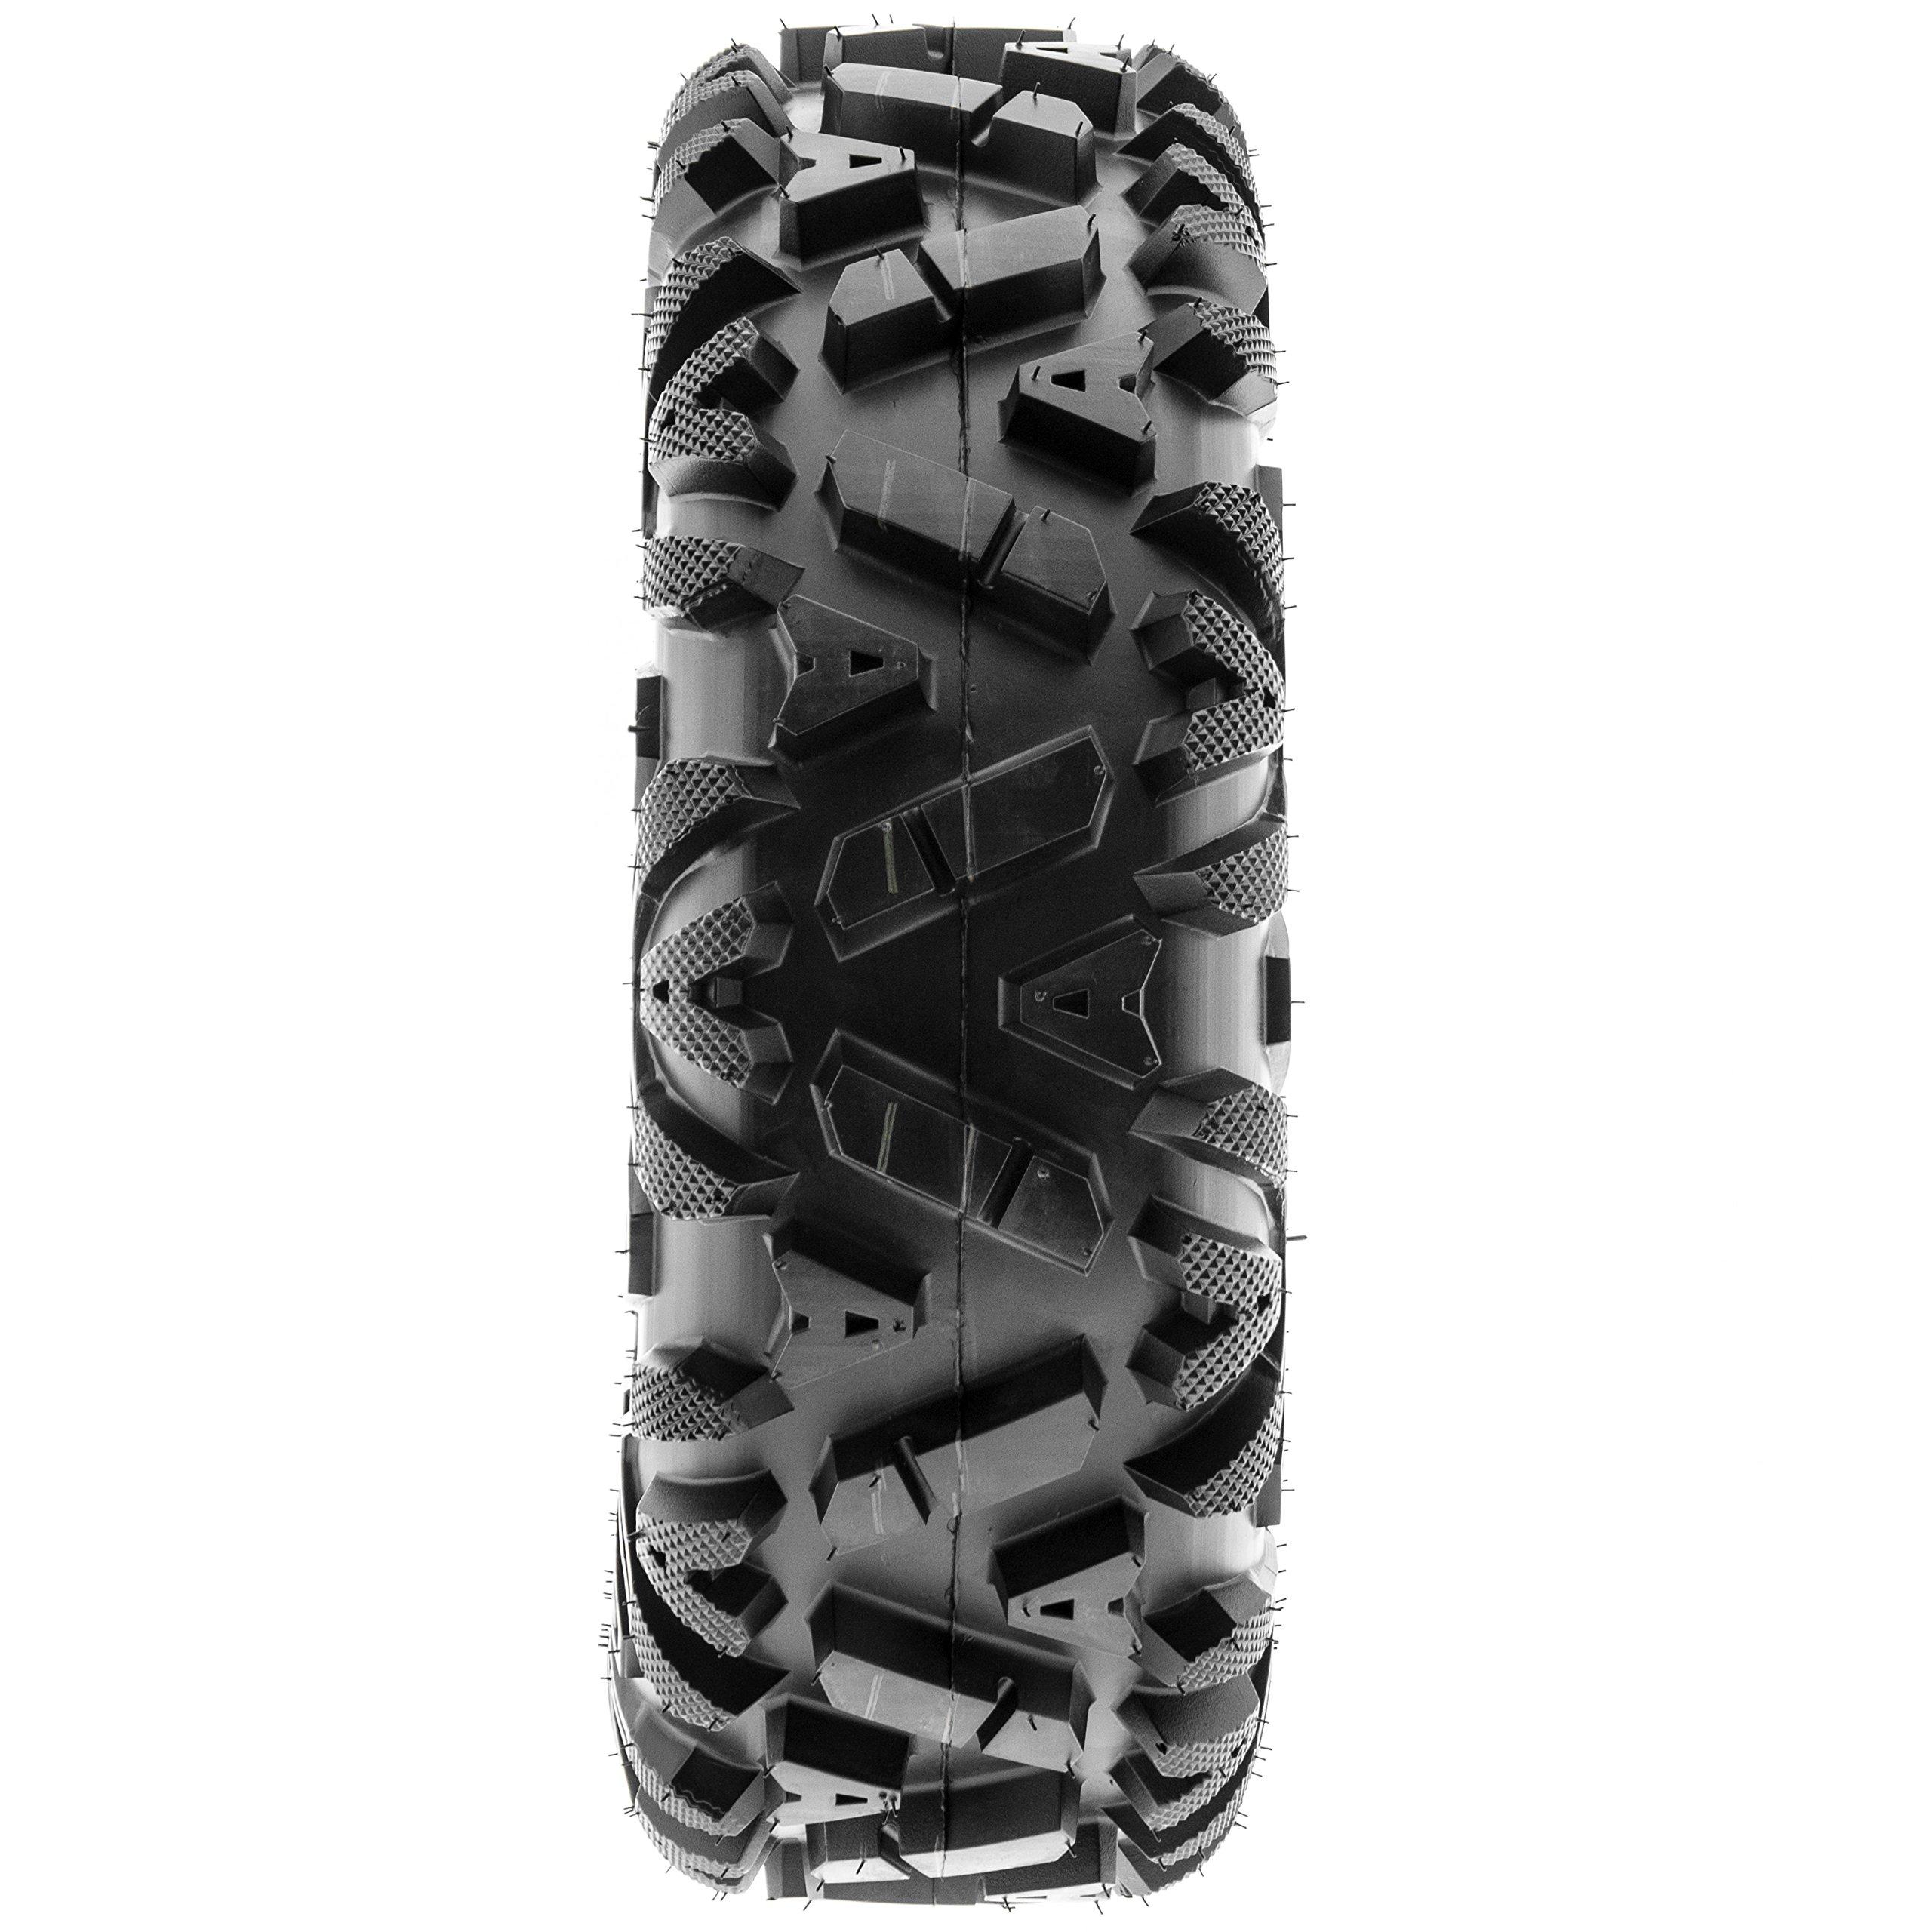 SunF A033 ATV/UTV Tire 28x9-12 Front & 28x11-12 Rear, Set of 4 by SunF (Image #4)